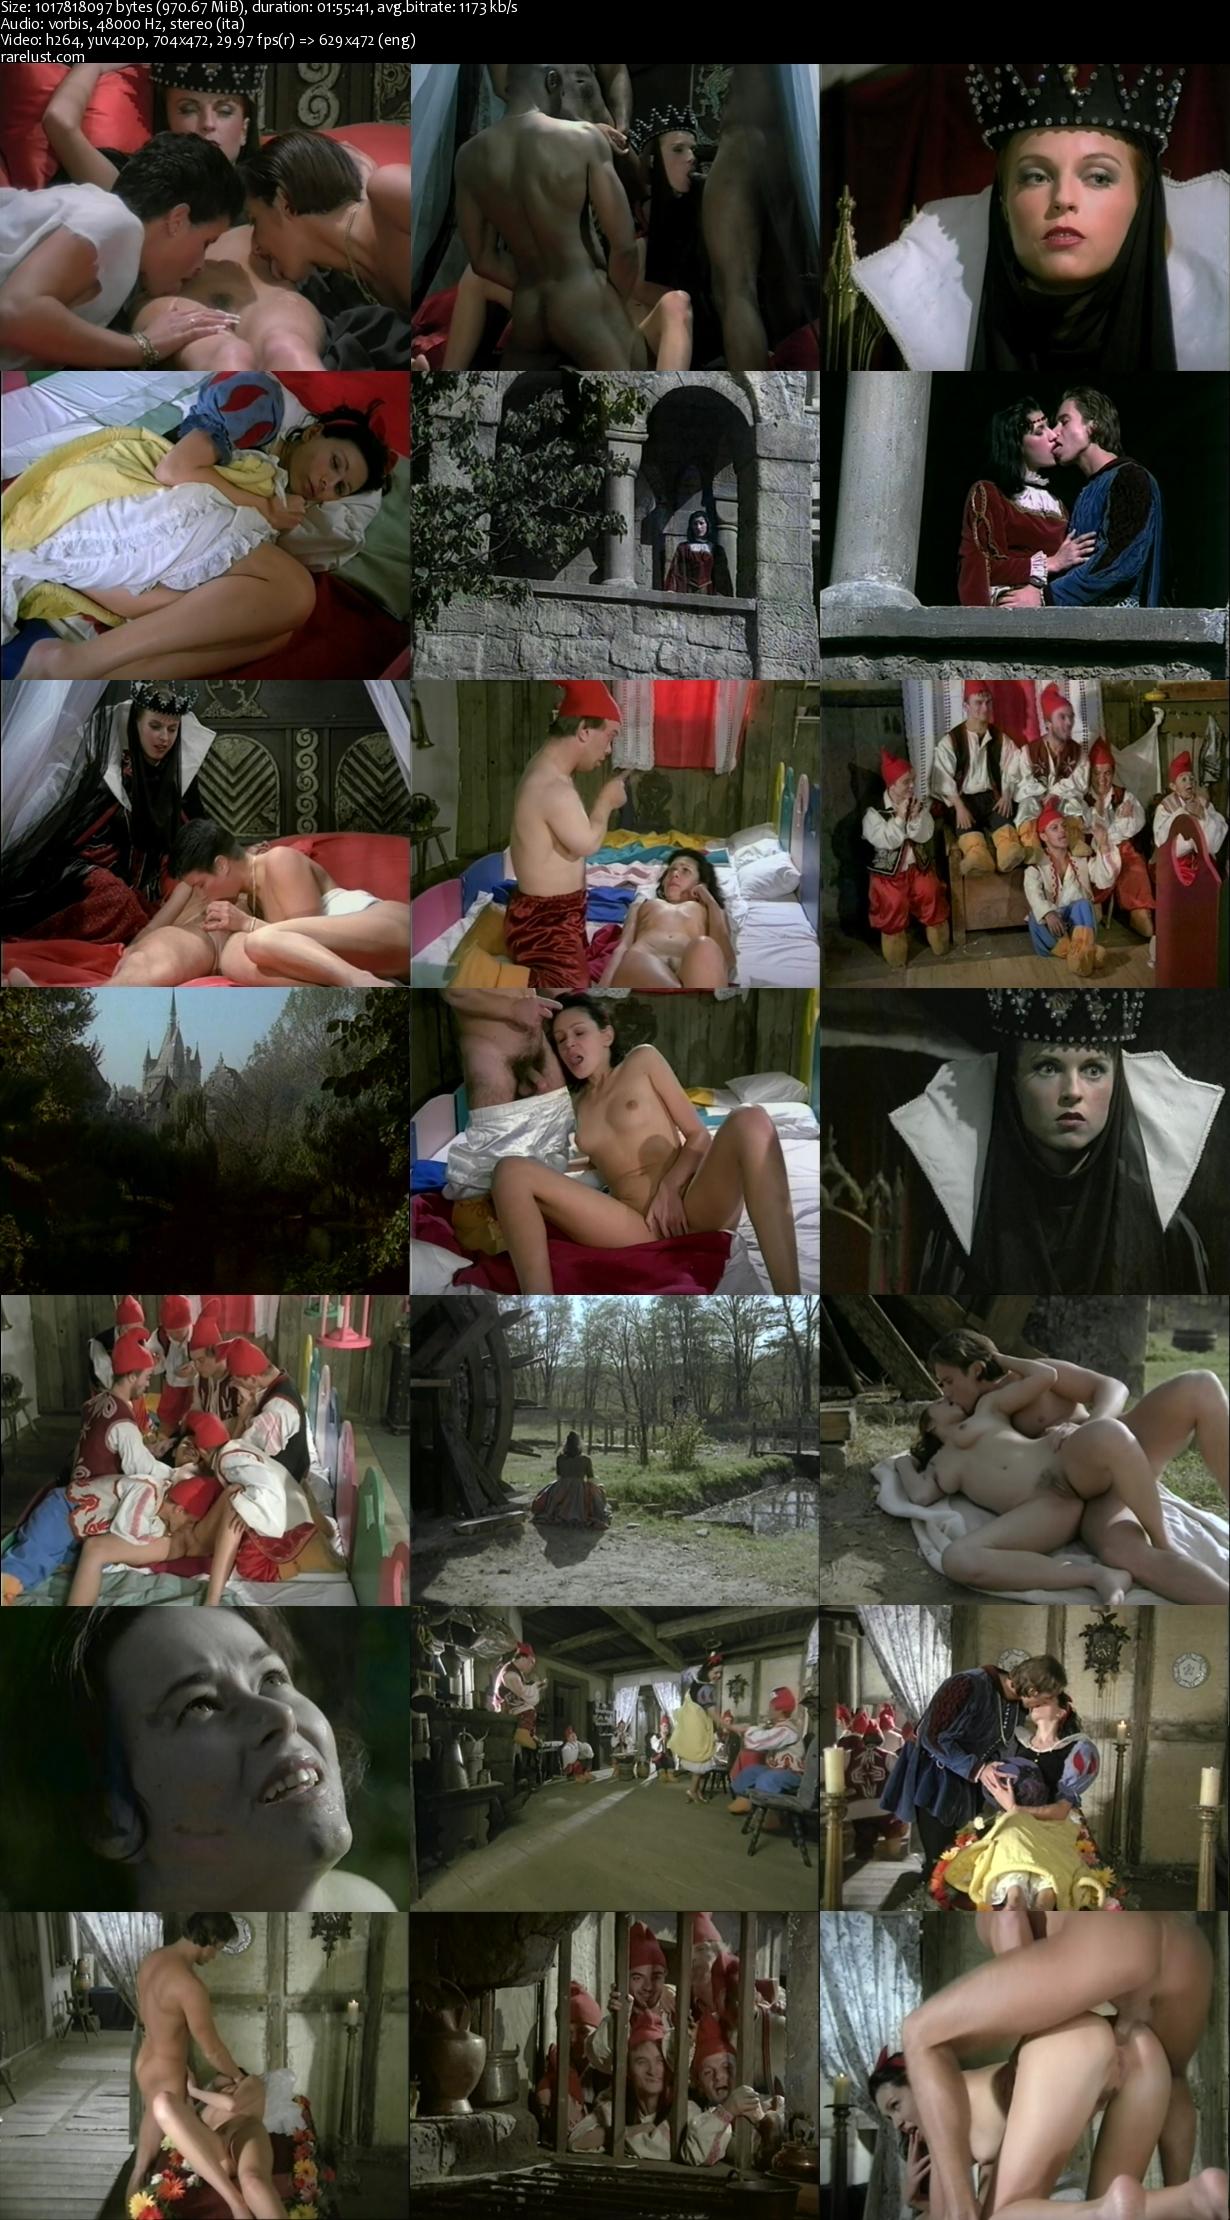 snow_white_7_dwarfs_1995